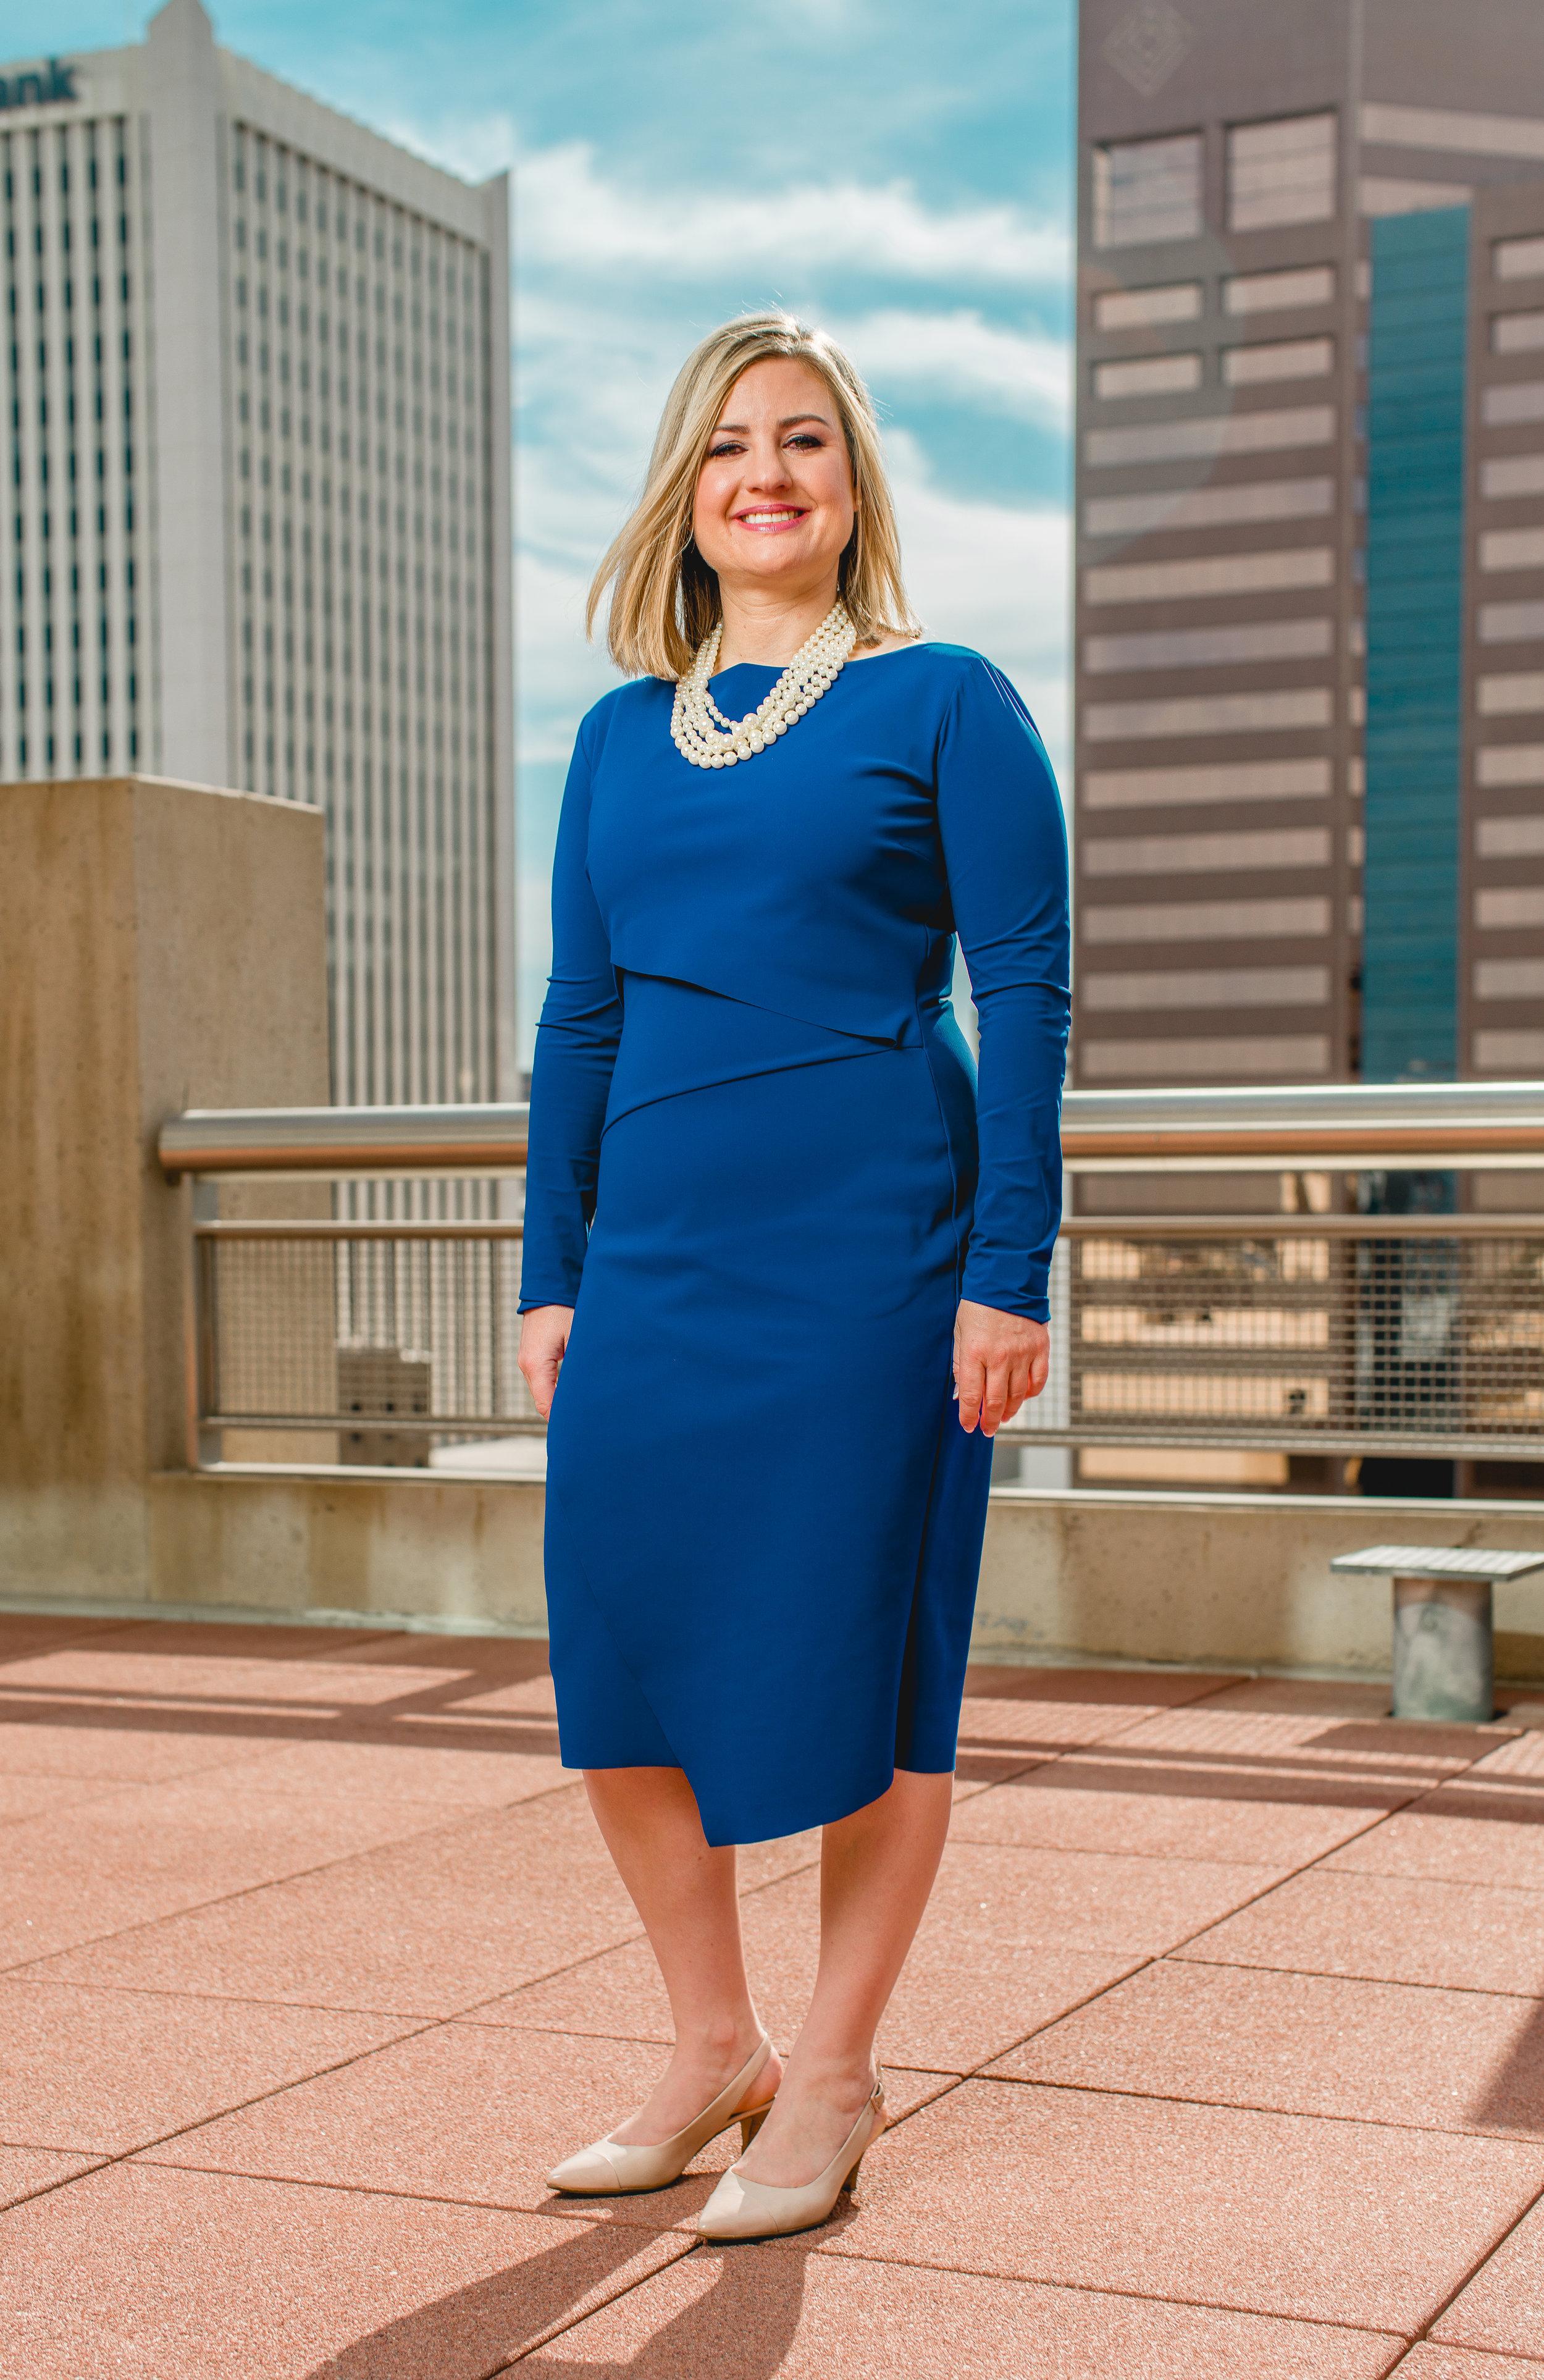 Mayor Kate Gallego